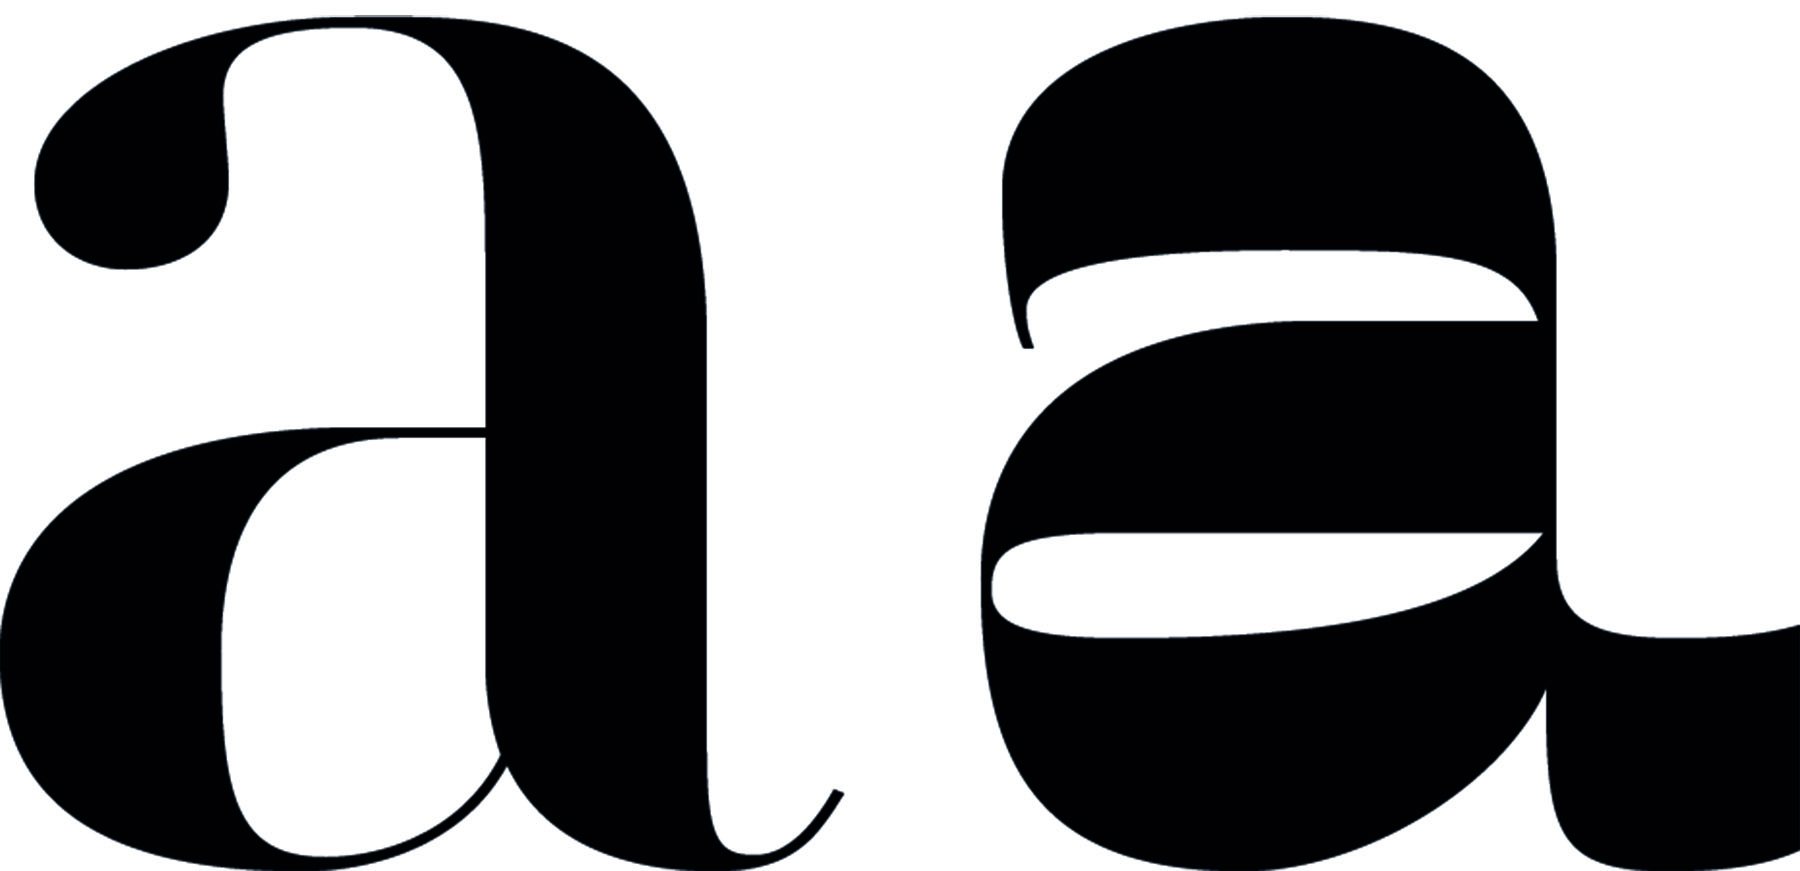 Karloff Beta AA, Peter Bi'lak, Typotheque, 2012